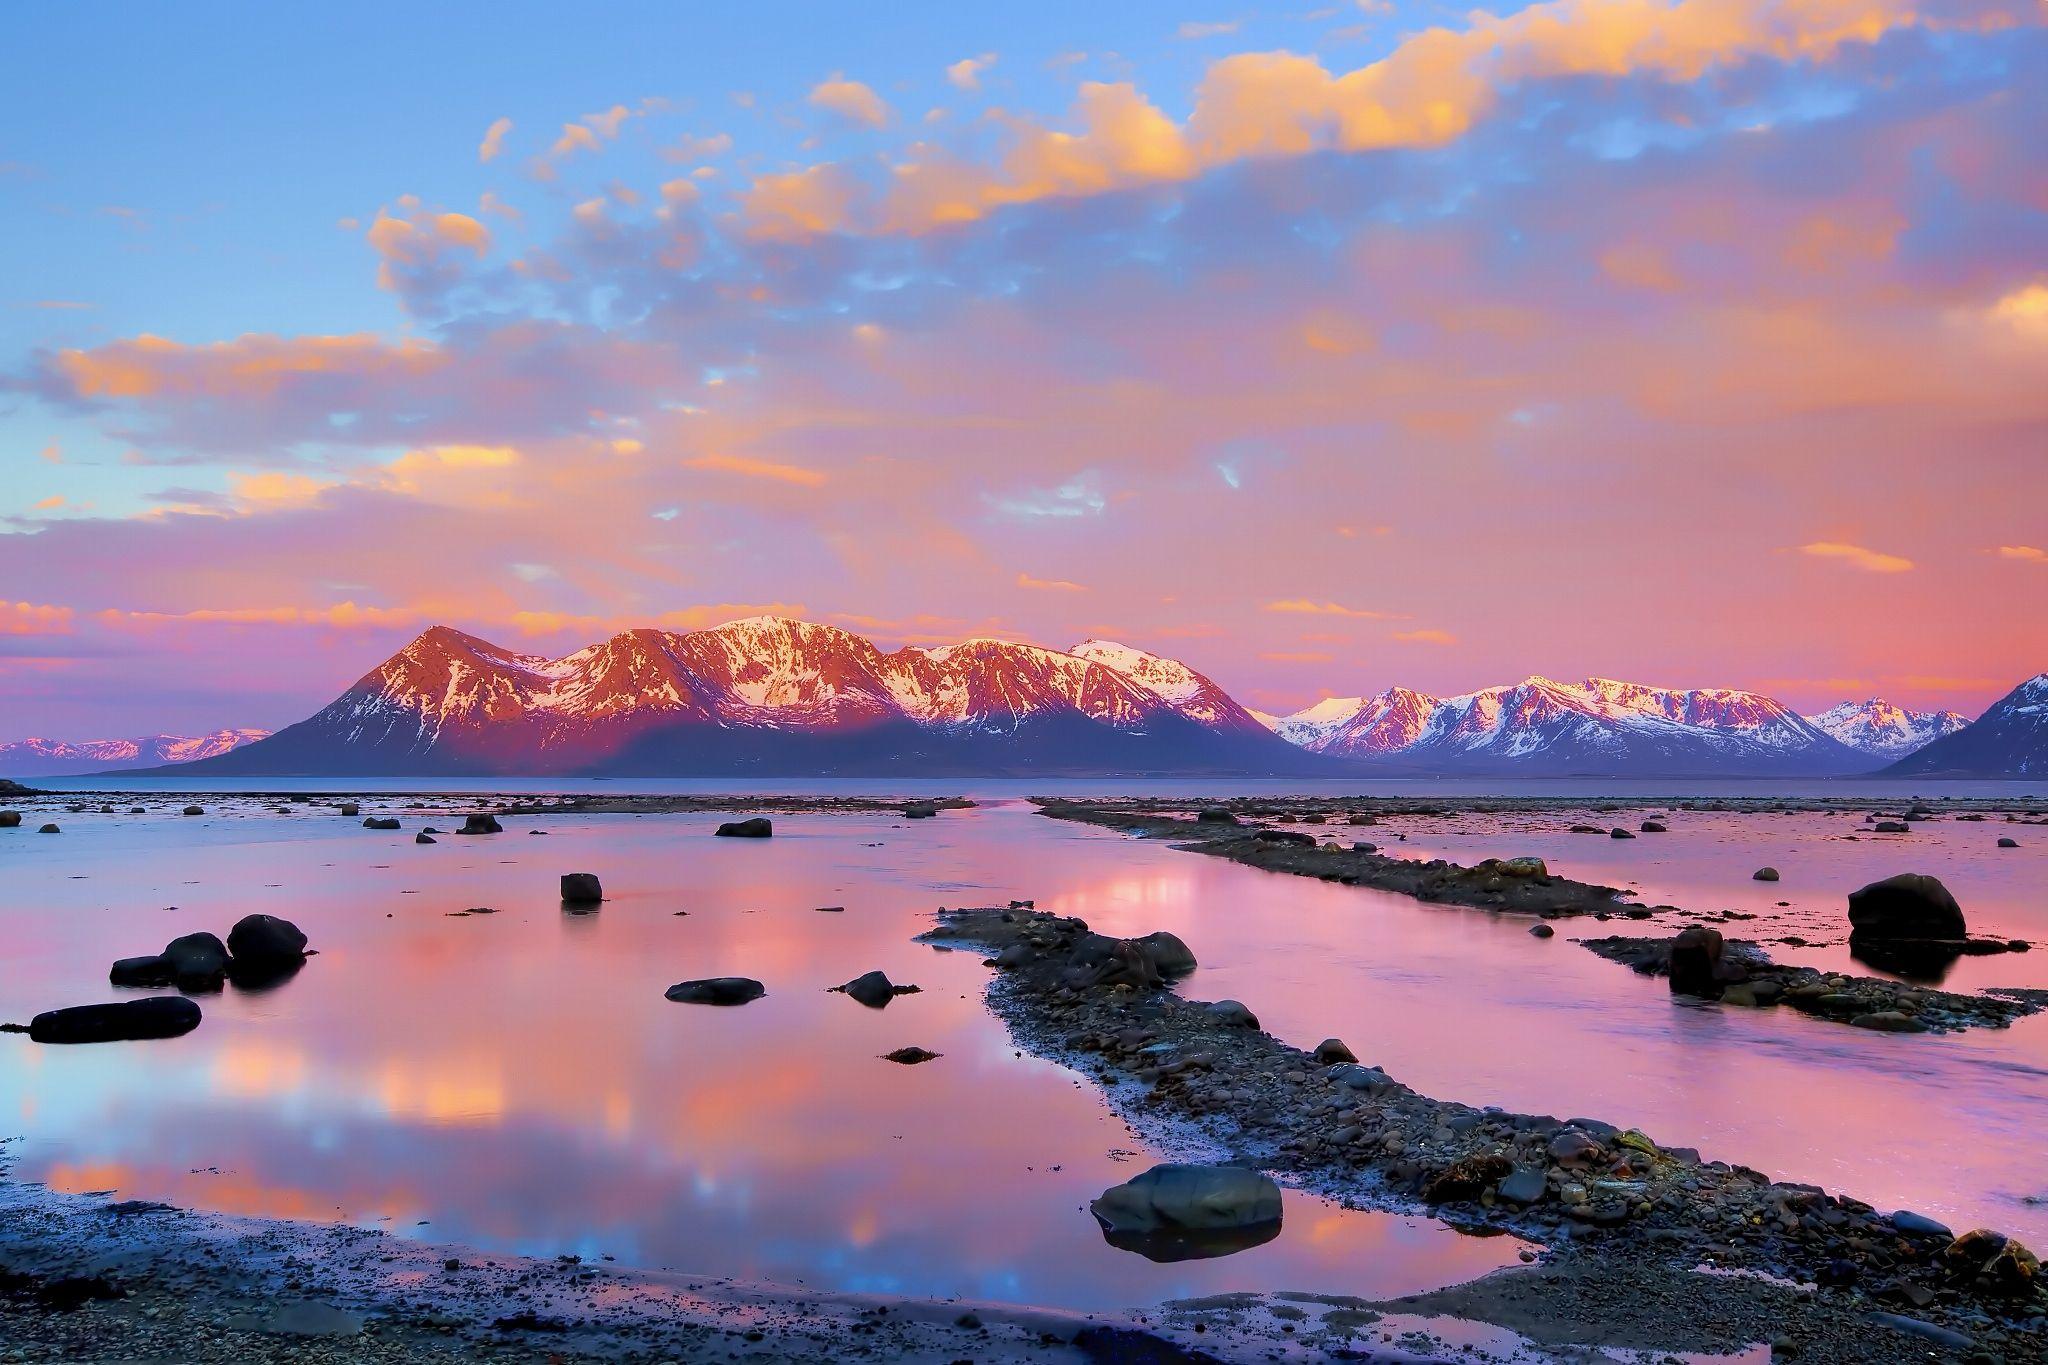 Midnight sun by Kjersti Busk Joergensen on 500px